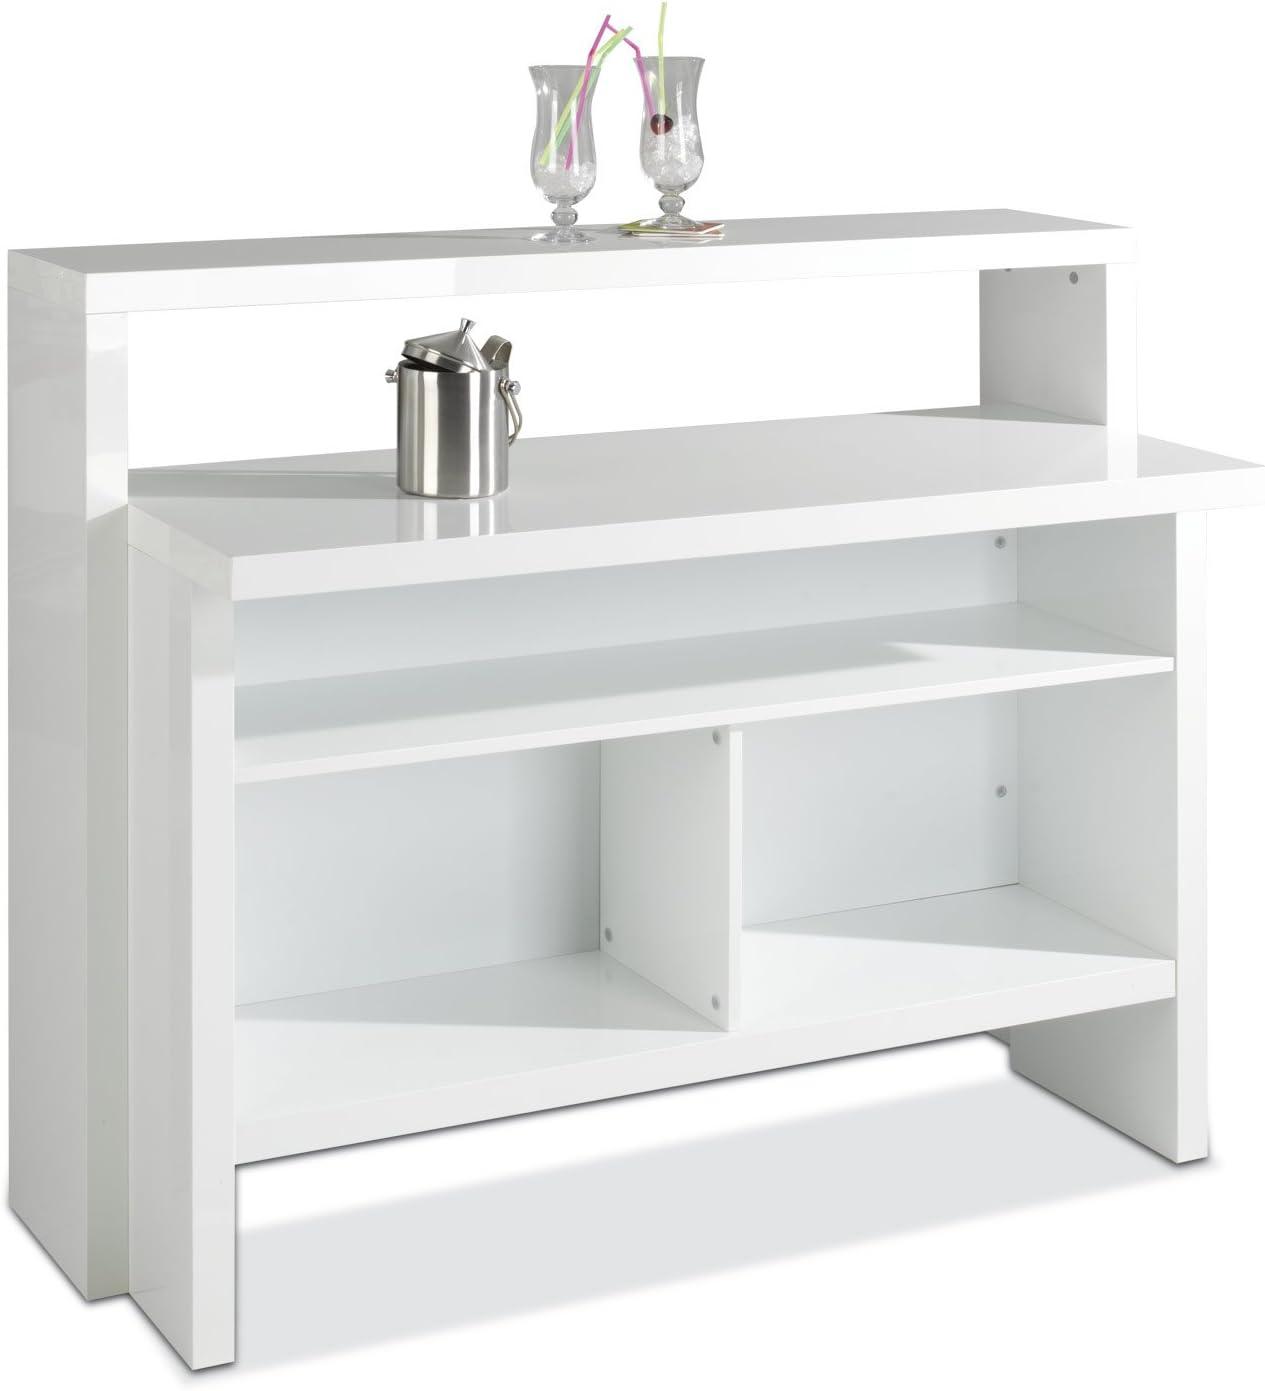 Hausbar Bar Minibar | Dekor | Weiß Hochglanz | B 130 cm x H 110 cm x T 50 cm: Amazon.de: Küche & Haushalt - Cocktailbar kaufen